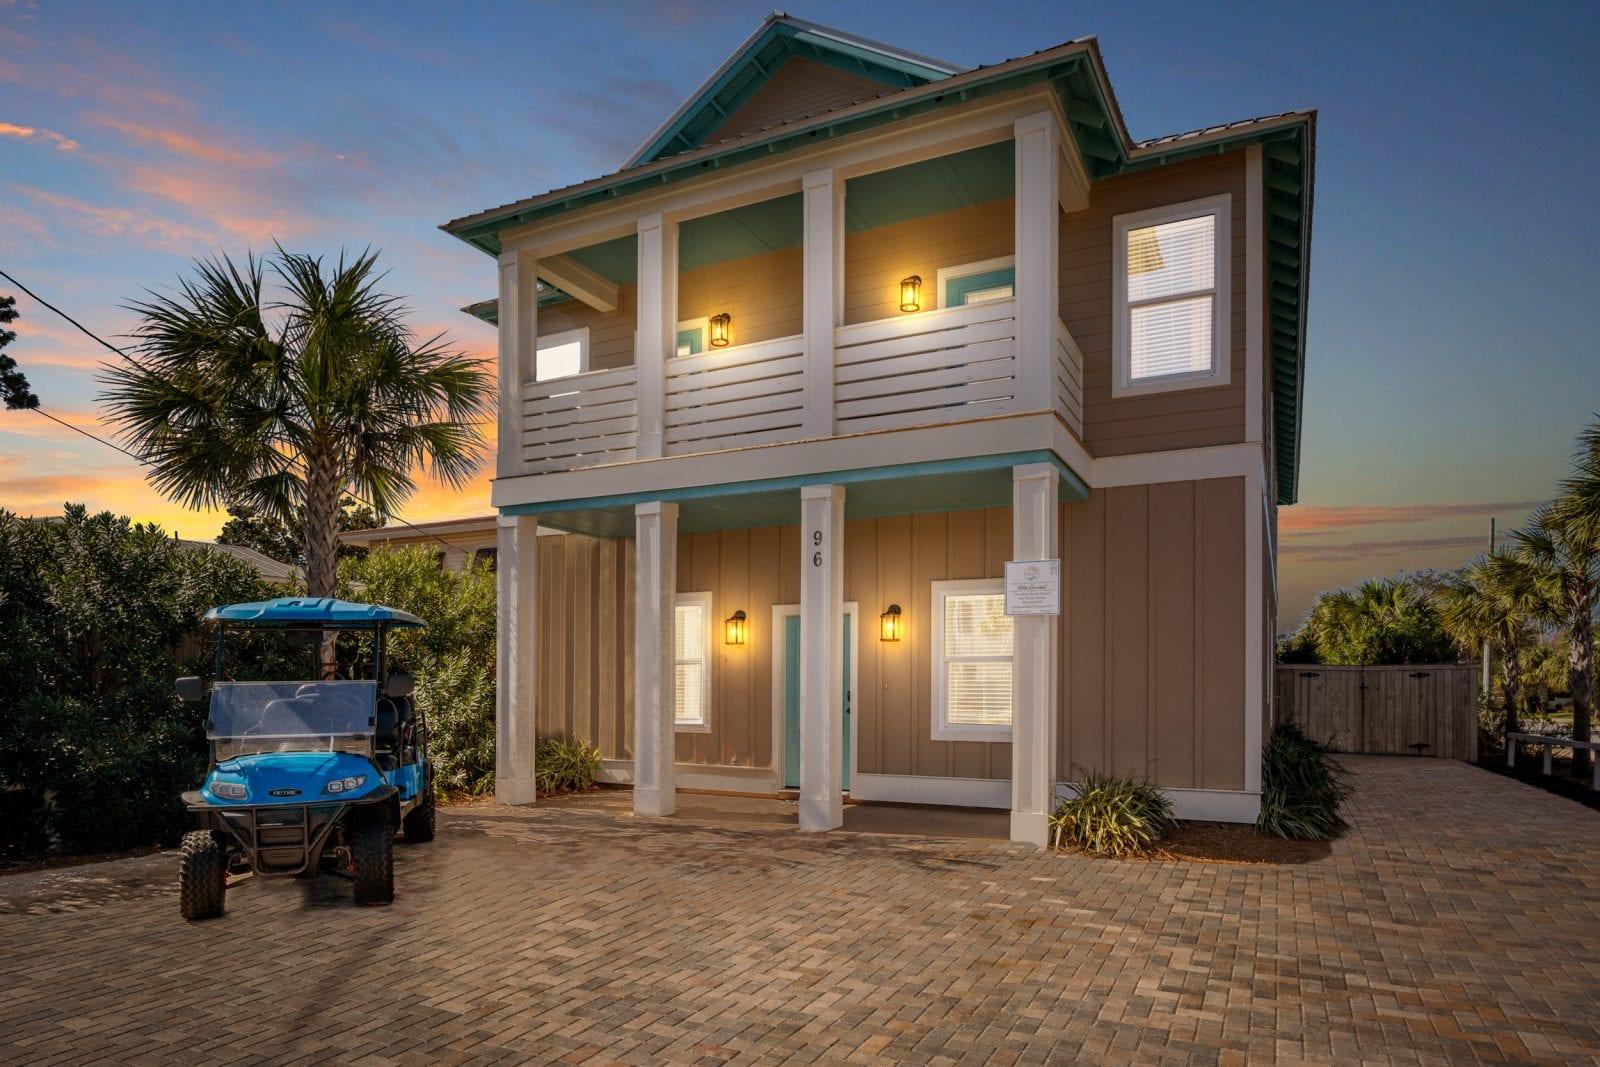 Blue Coconut Destin Florida Vacation Rental Home